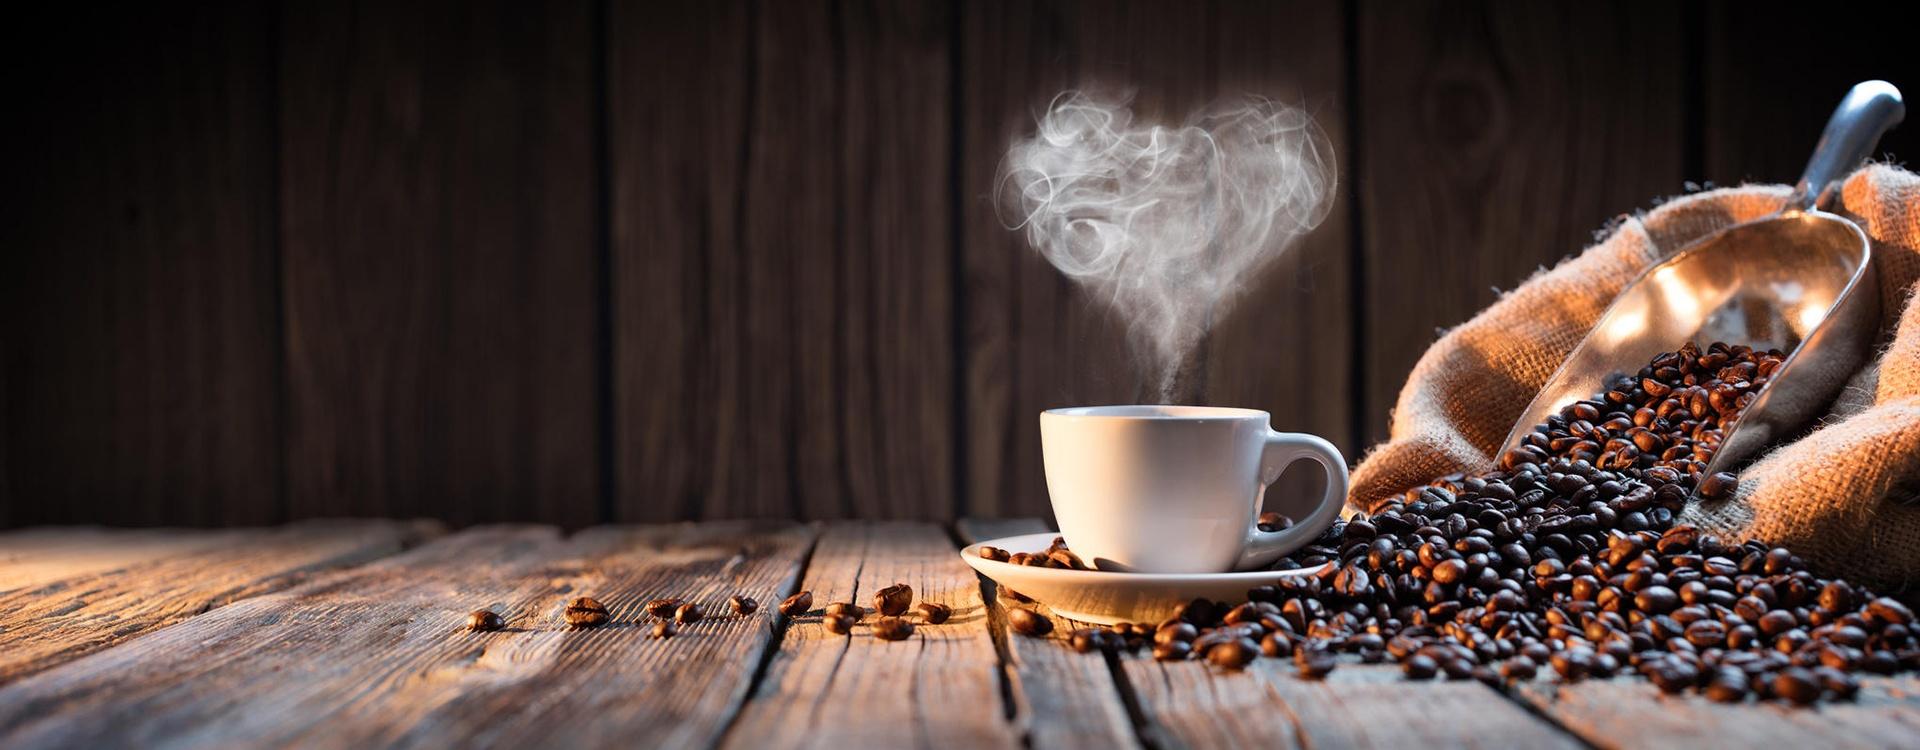 Vente en ligne de café en grains